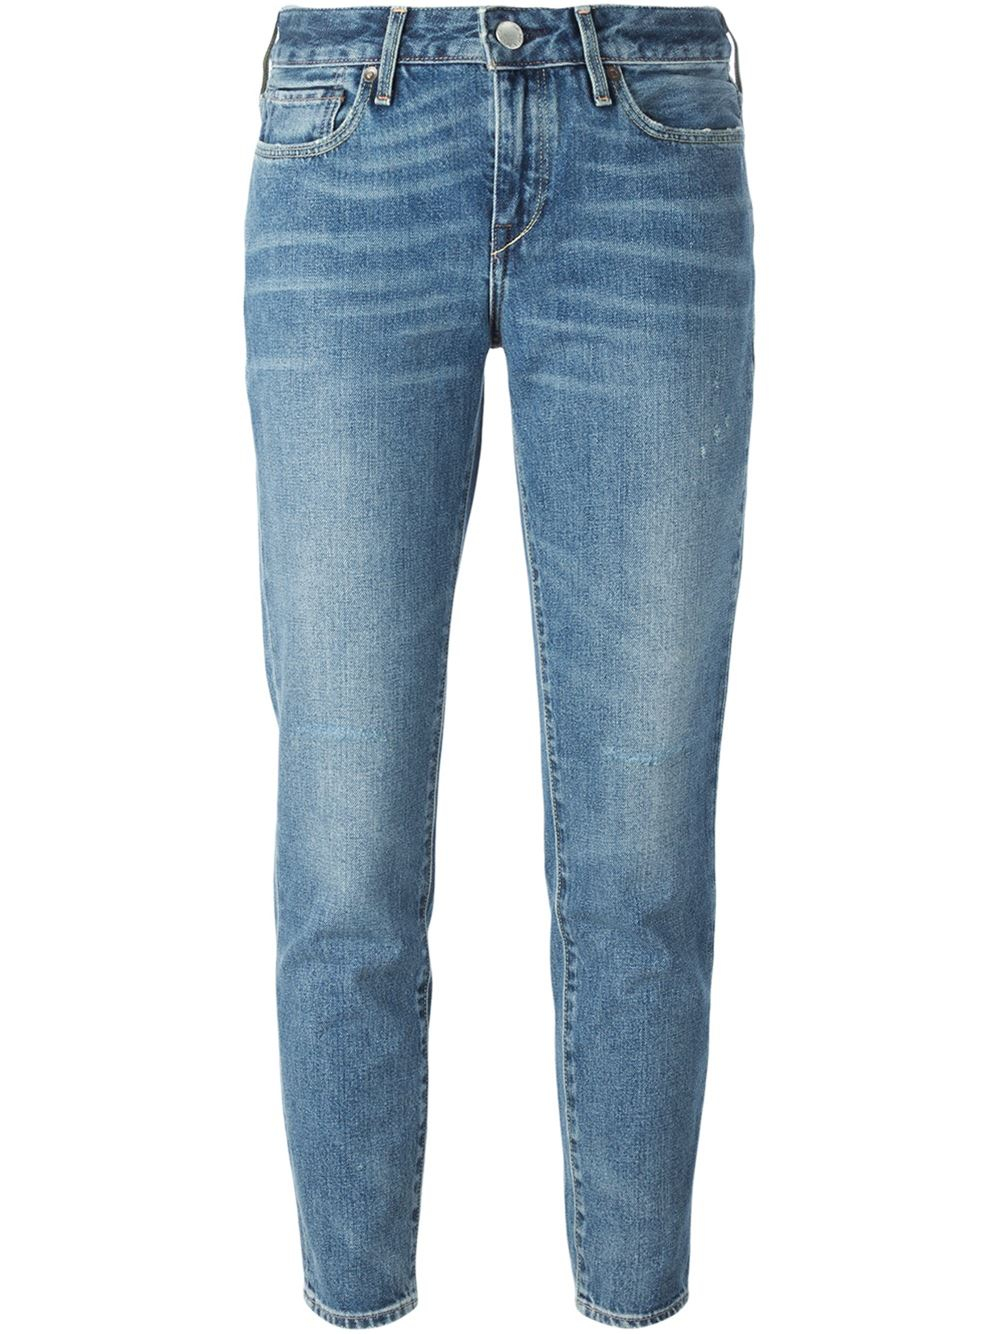 Just Cavalli Mens Jeans